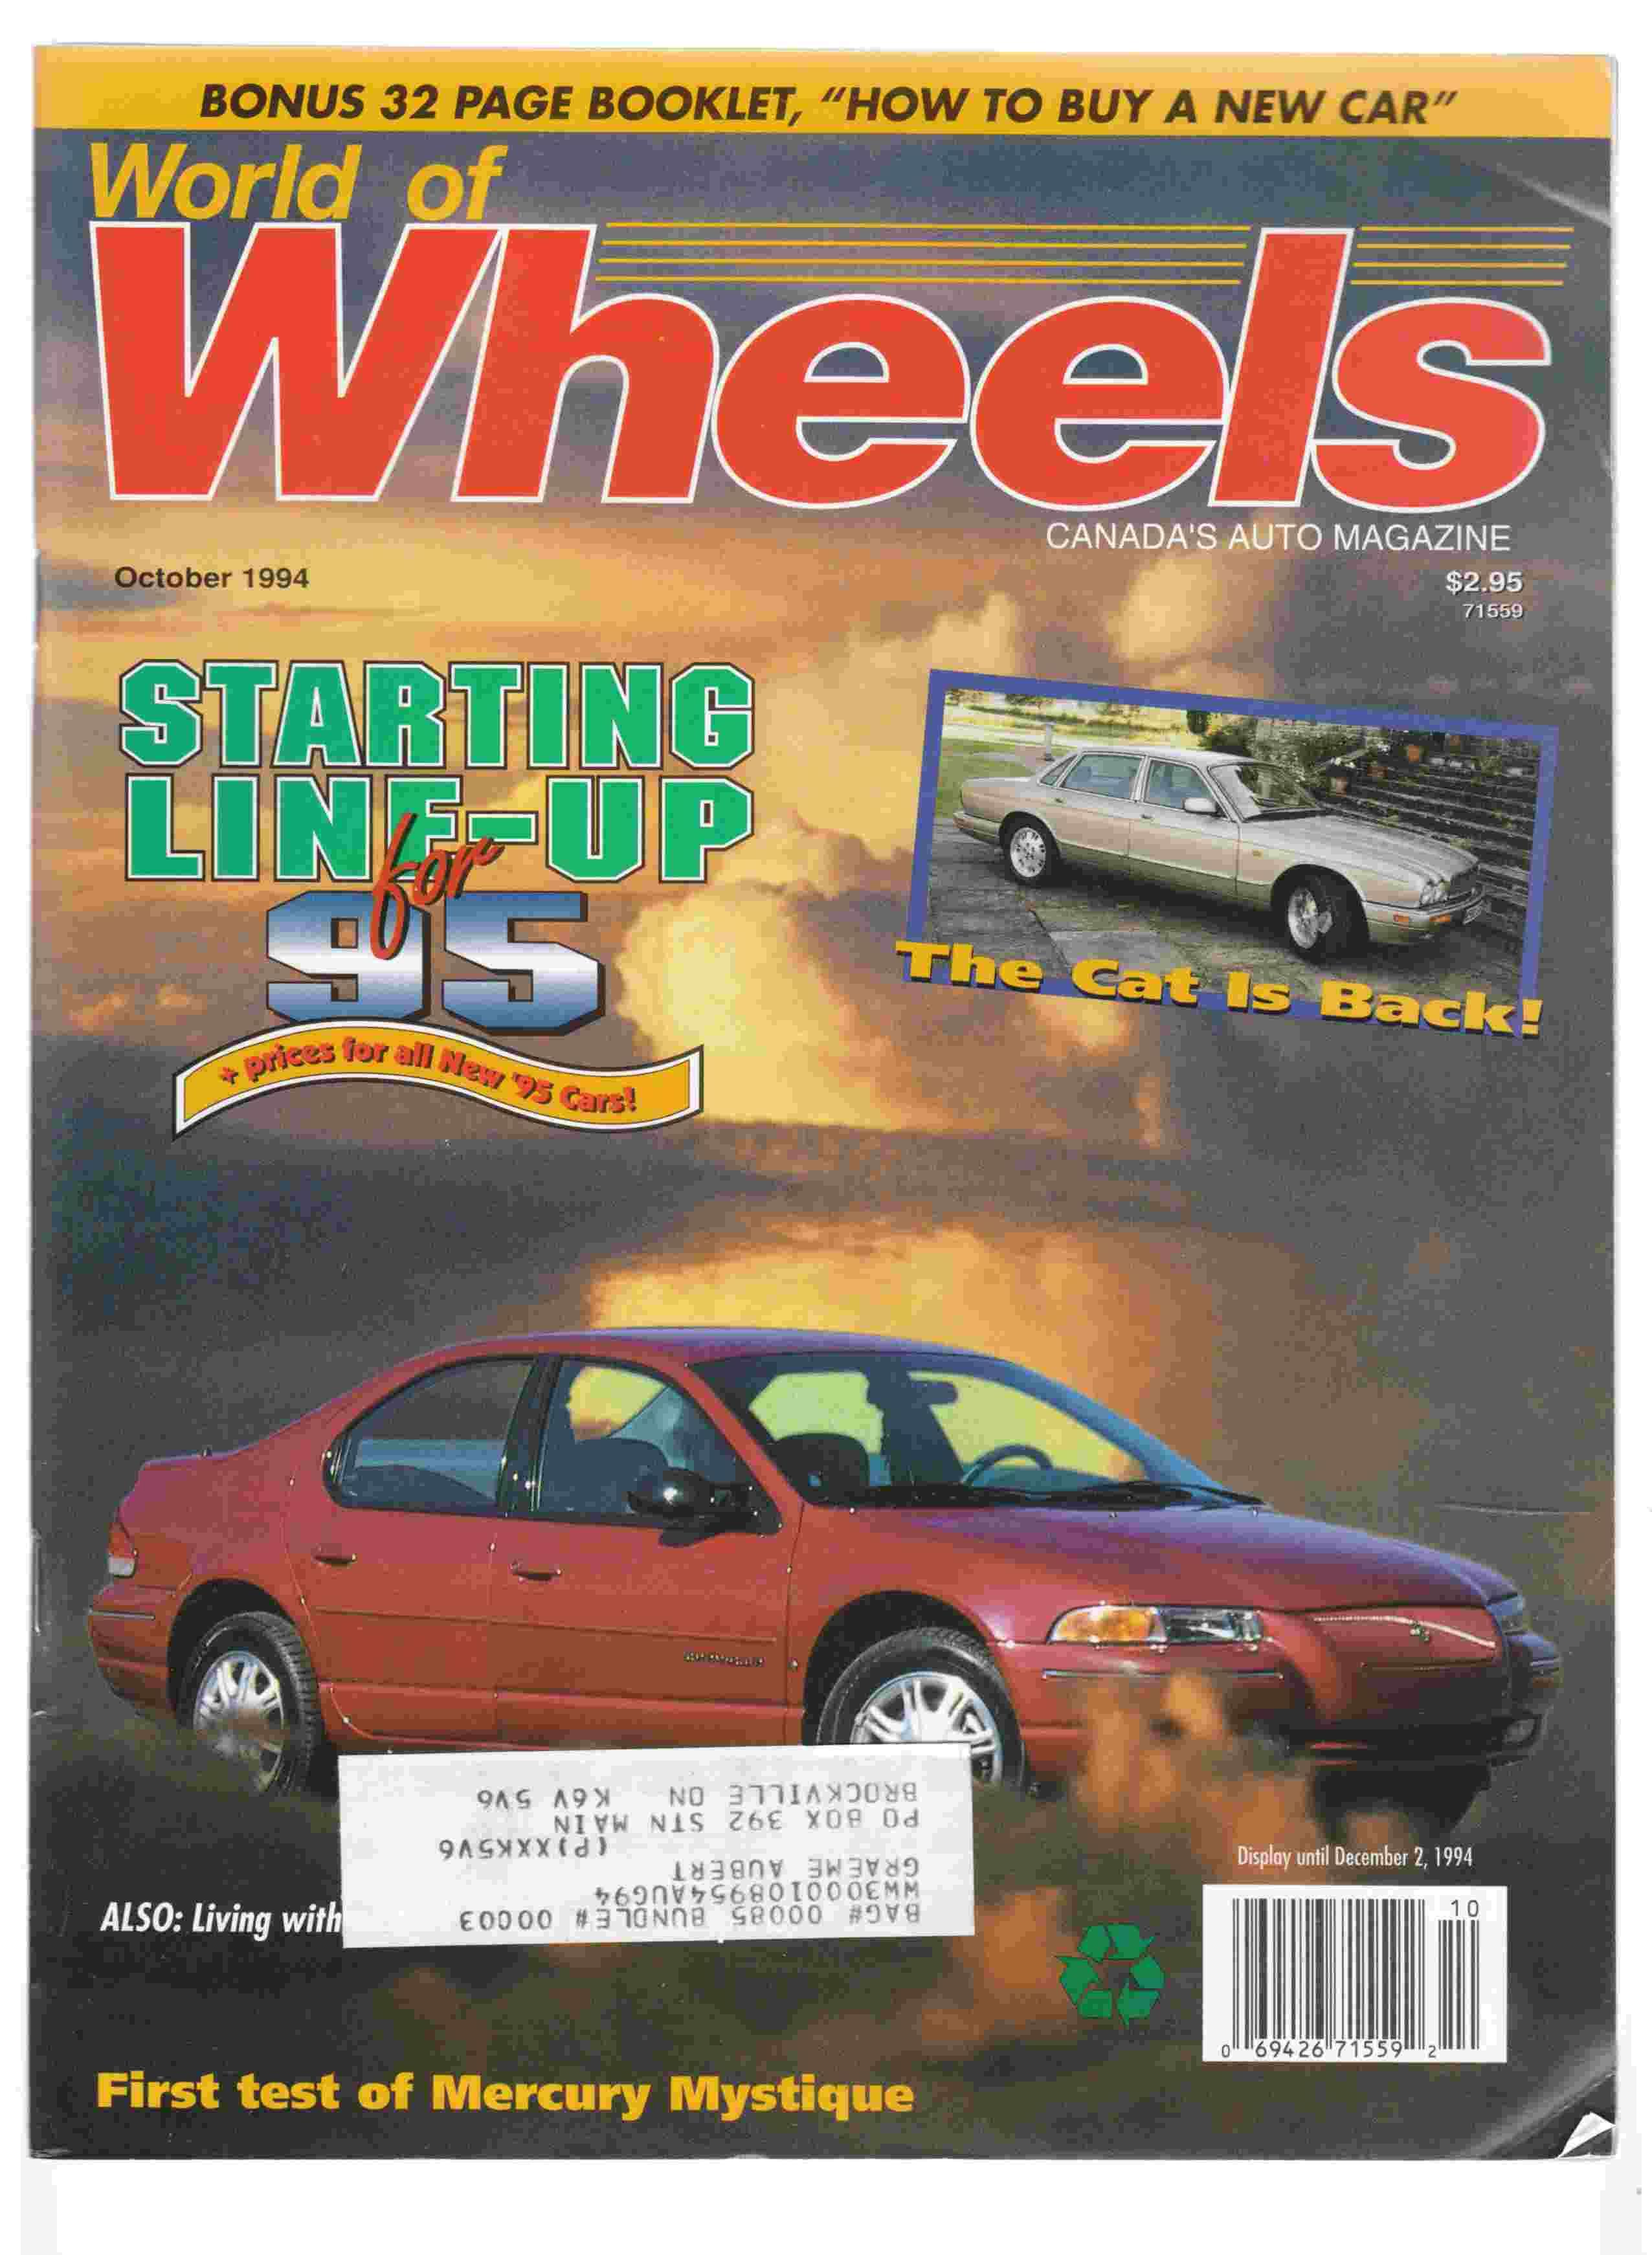 World of Wheels Canada\'s Auto Magazine October, 1994 Vol. 12, No. 5